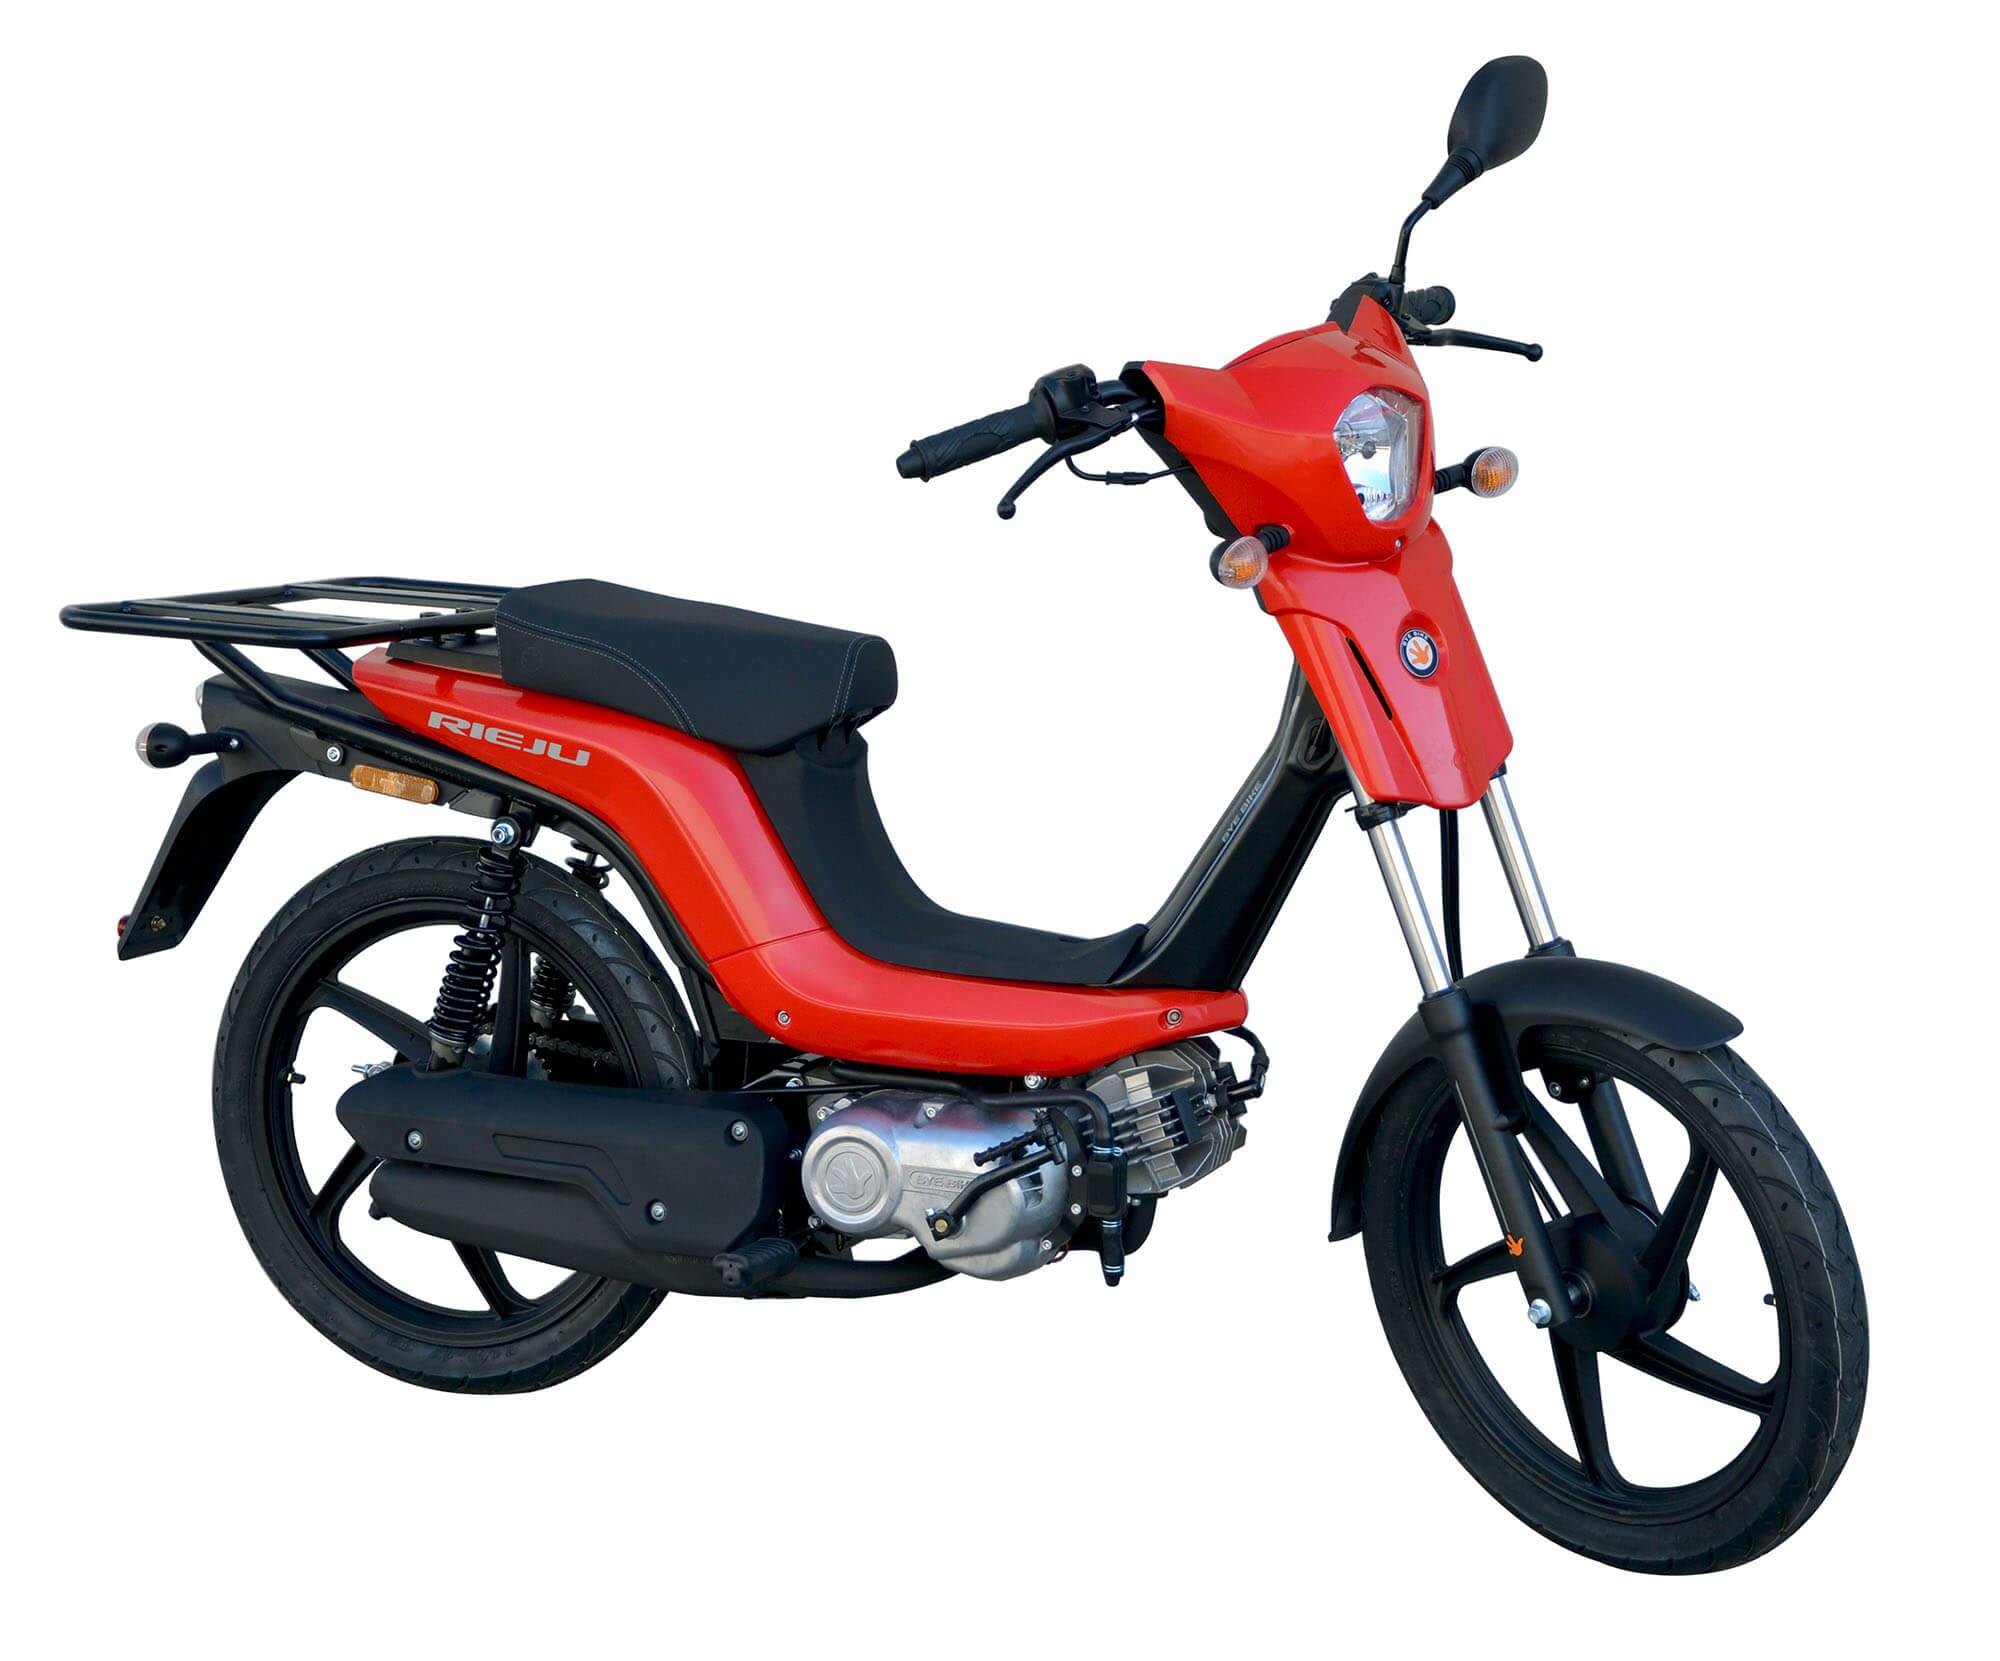 comprar-motos-rieju-bye-bike-50-rojo-motissimo-barcelona